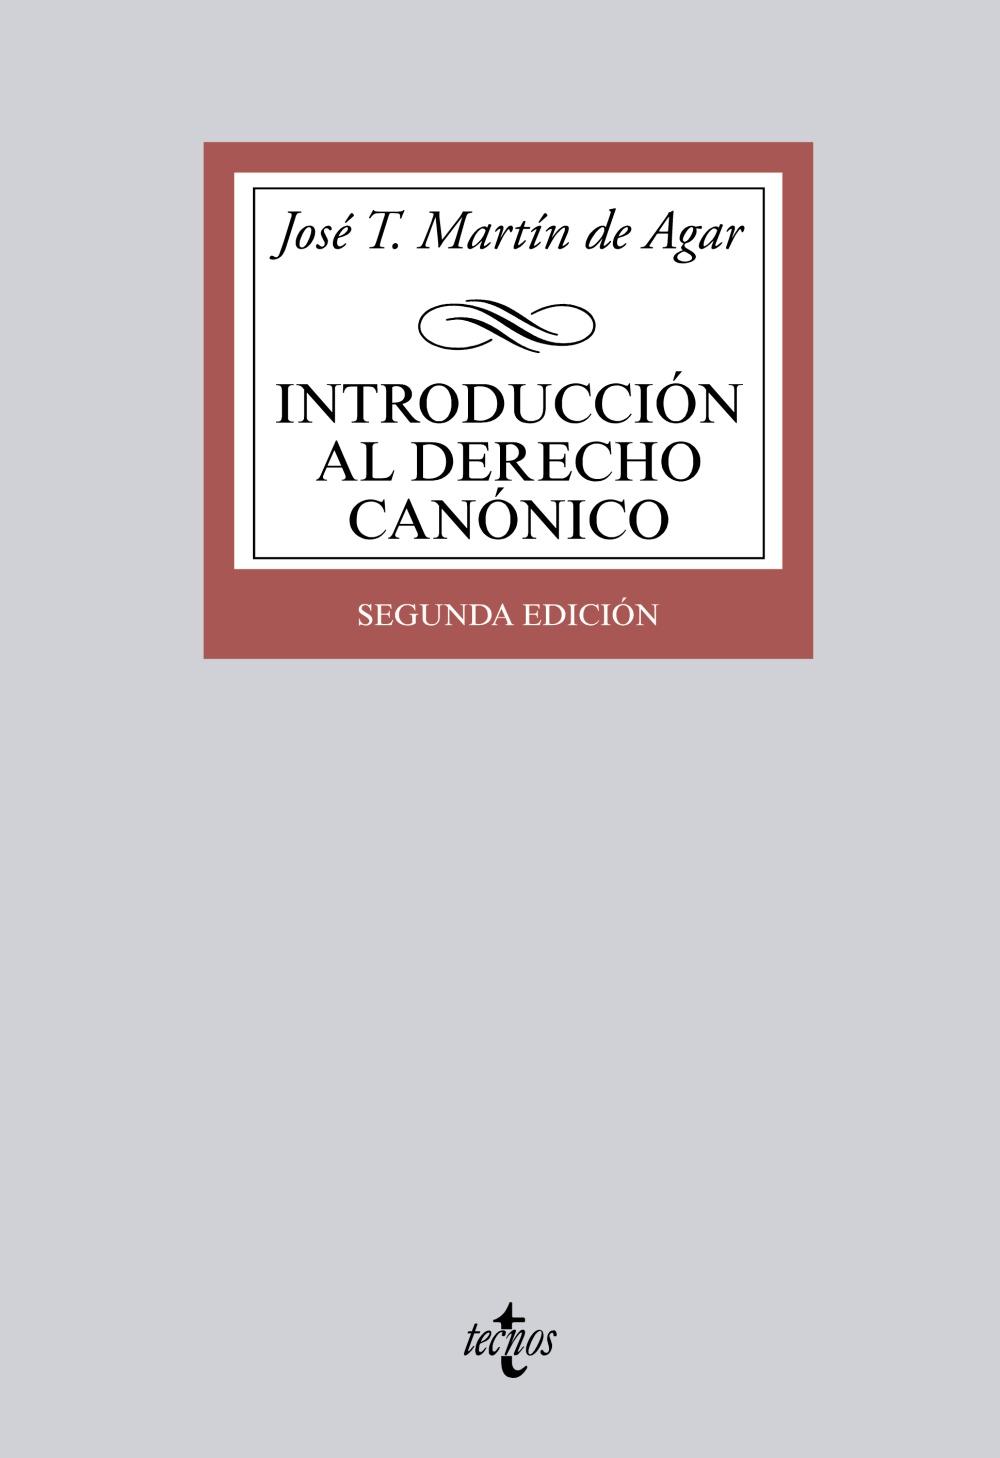 introducción al derecho canónico-jose tomas martin de agar-9788430962075